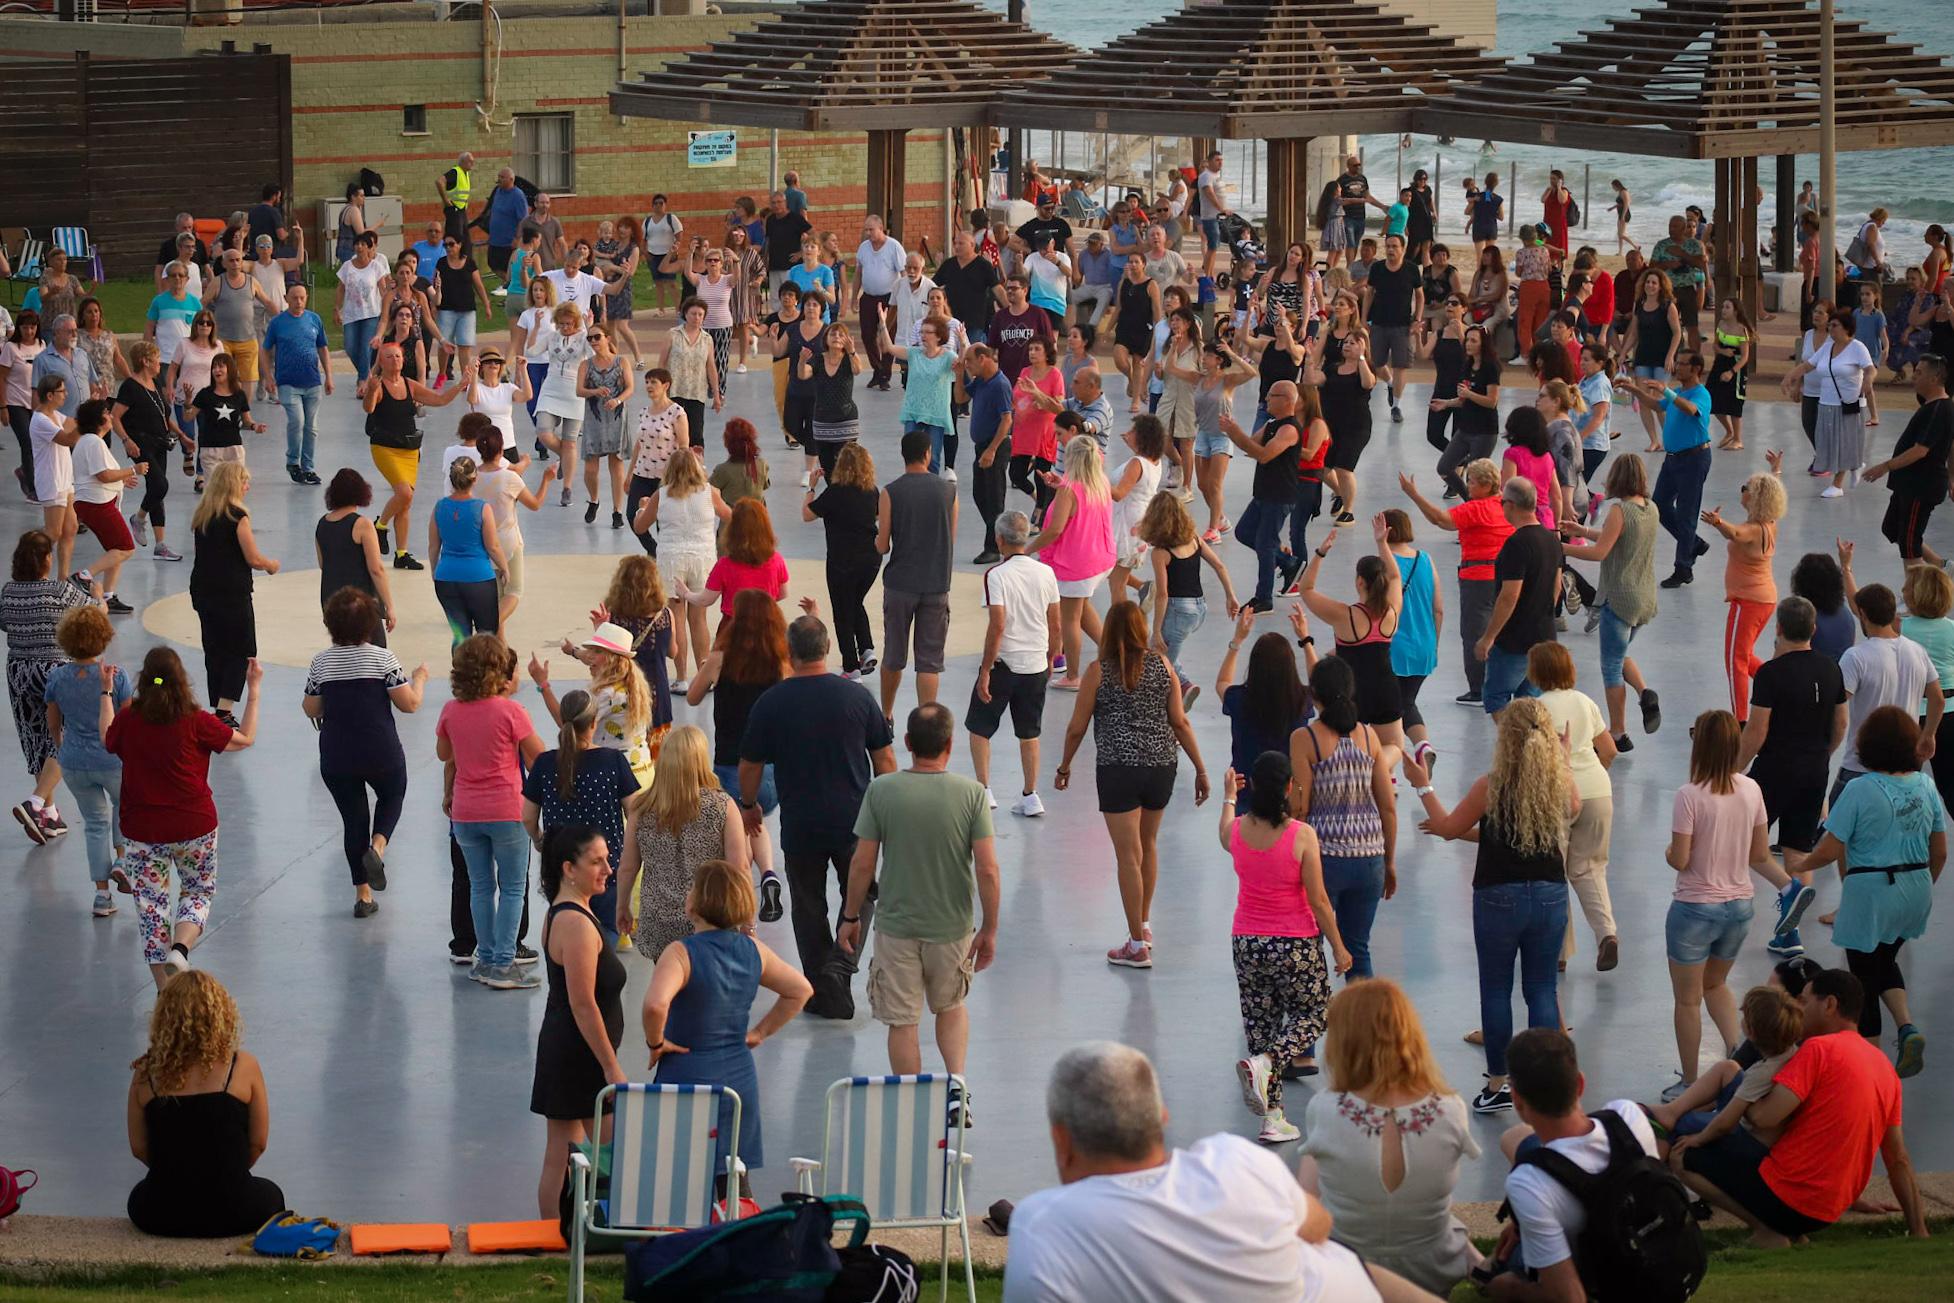 MarketIntelligence.org (Market Intelligence): Large-scale organized dancing in a public square created a huge multibillion market